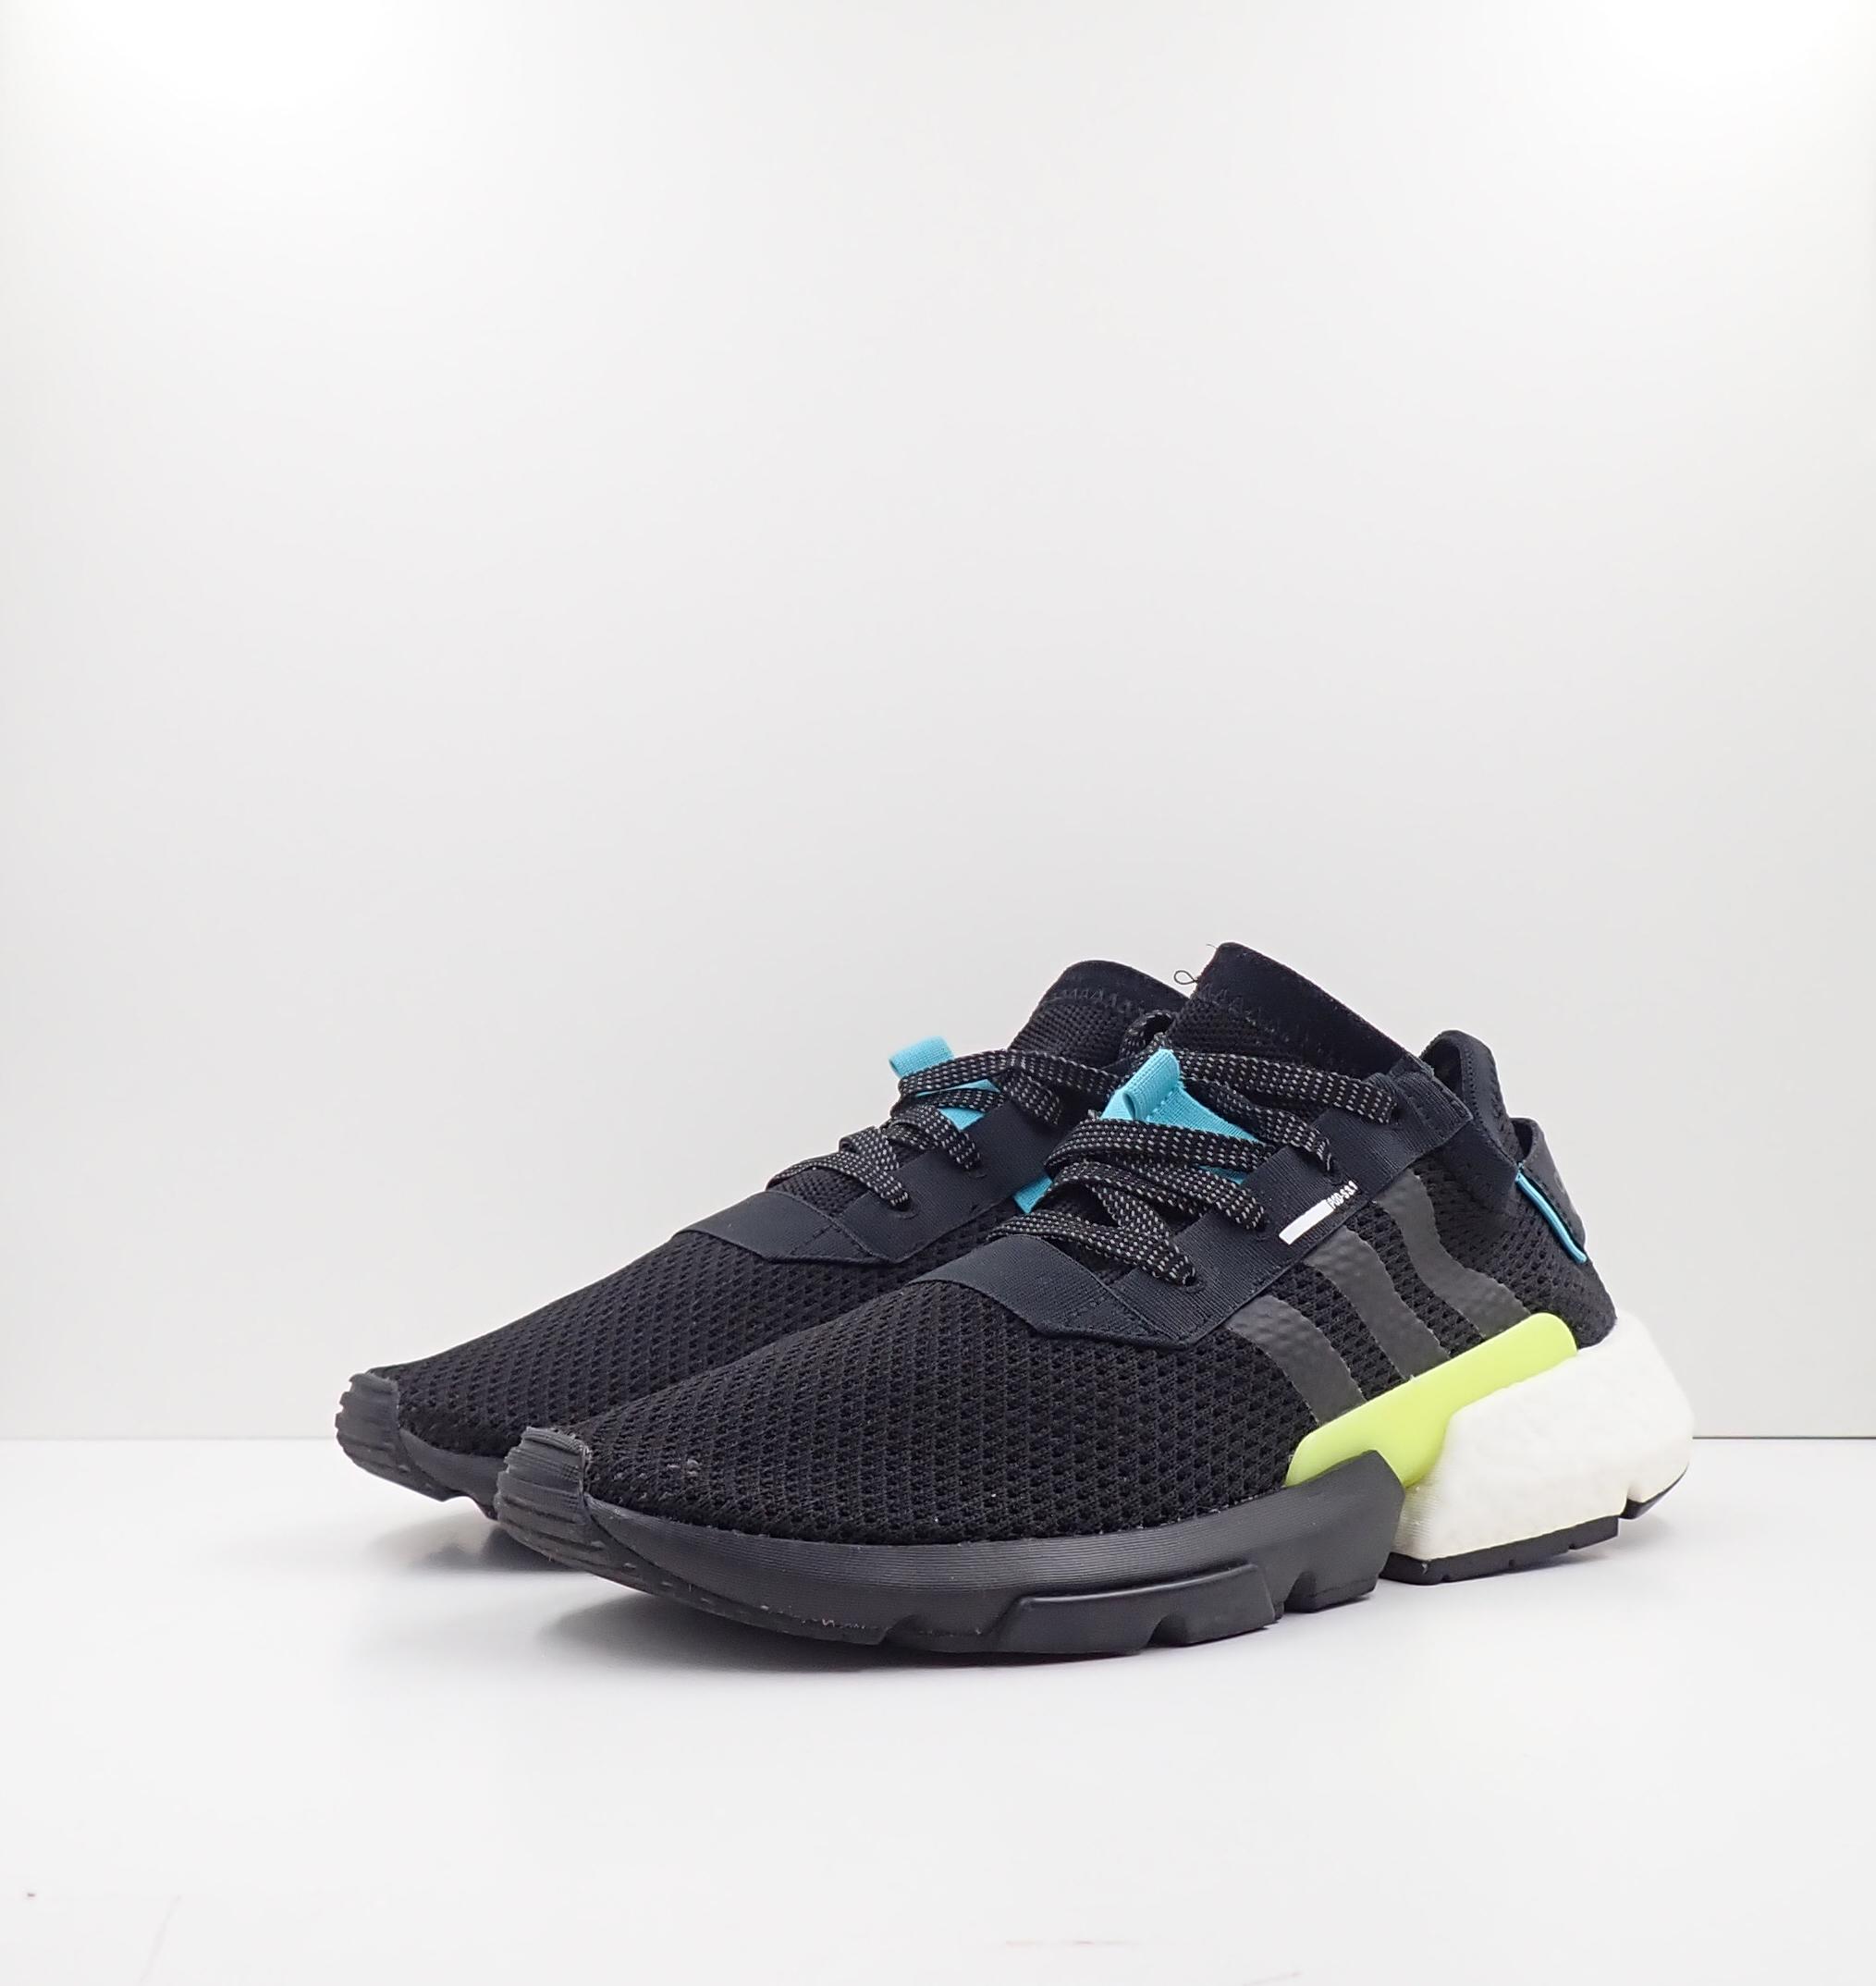 Adidas POD-S3.1 Black White